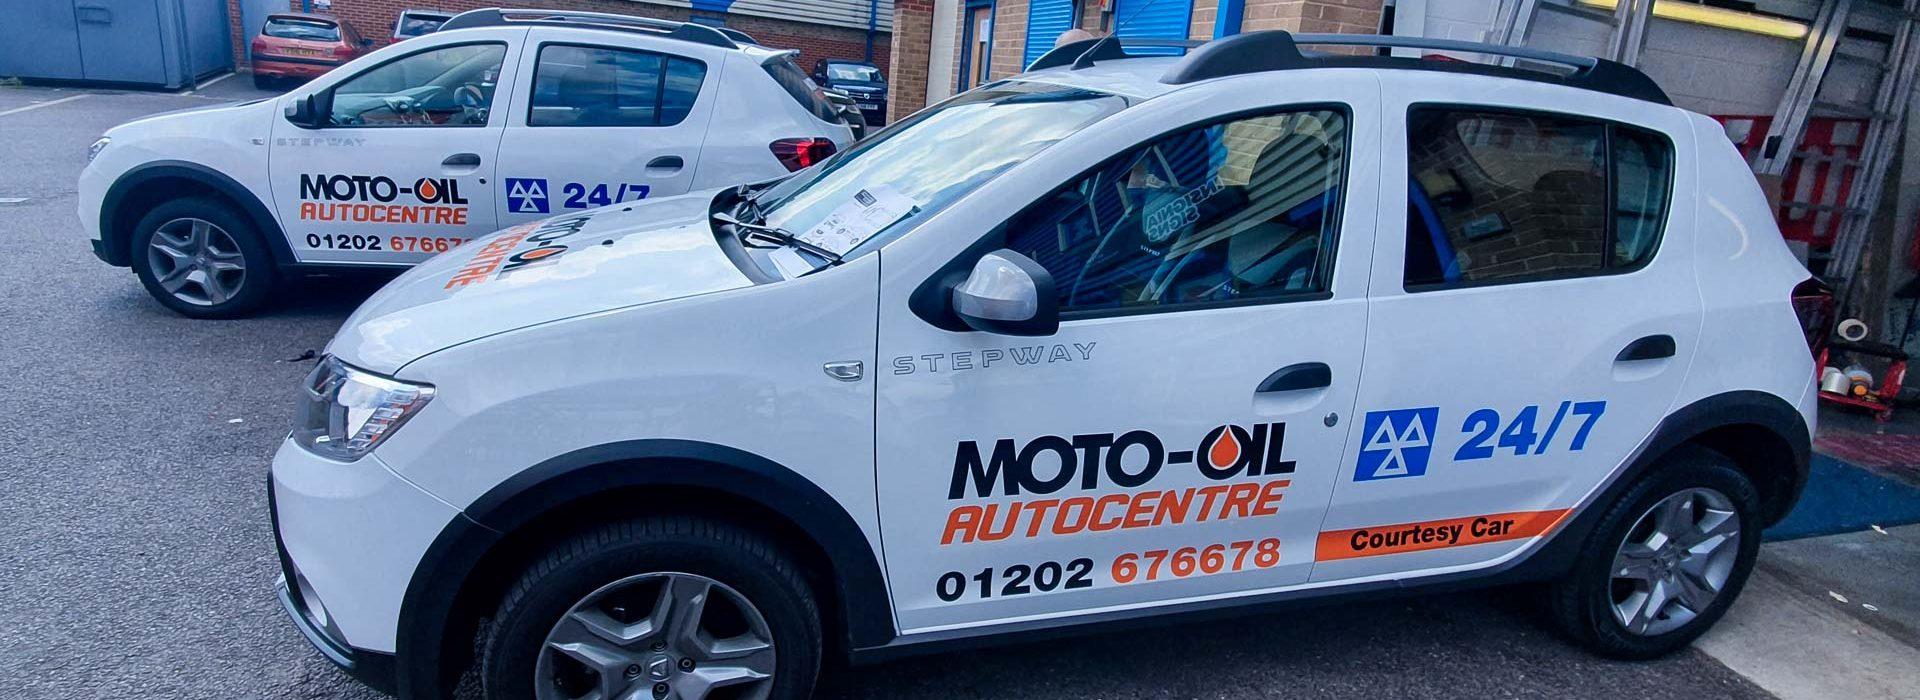 Moto-Oil Autocentre Cars Vehicle Wrap